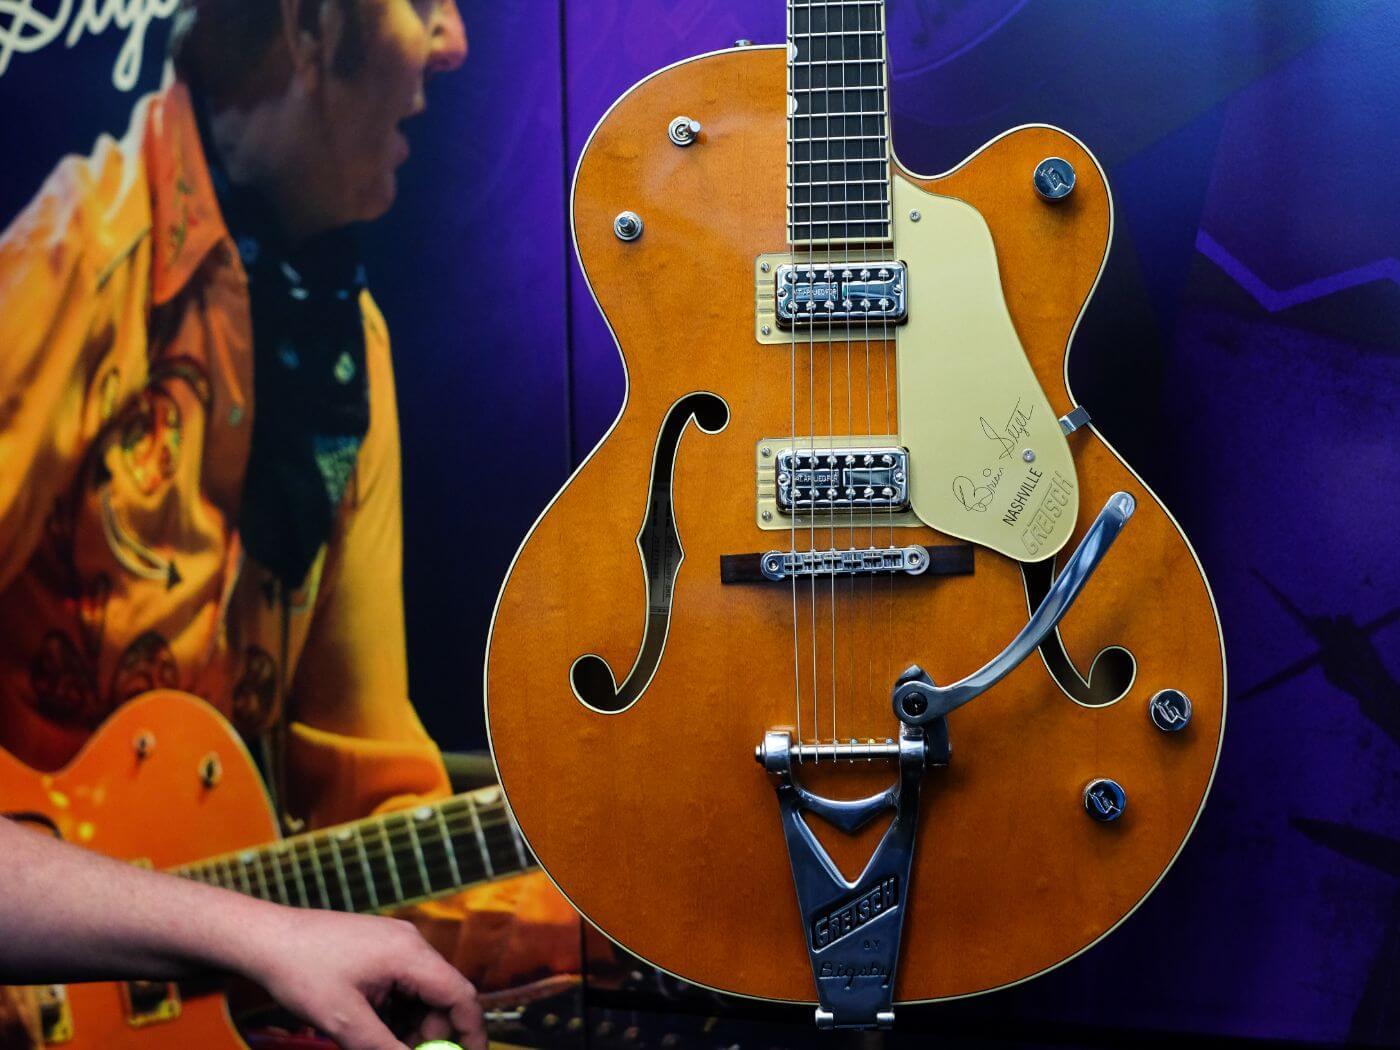 Gretsch 6120 Brian Setzer Signature Nashville Hollow Body '59 Smoke with Bigsby